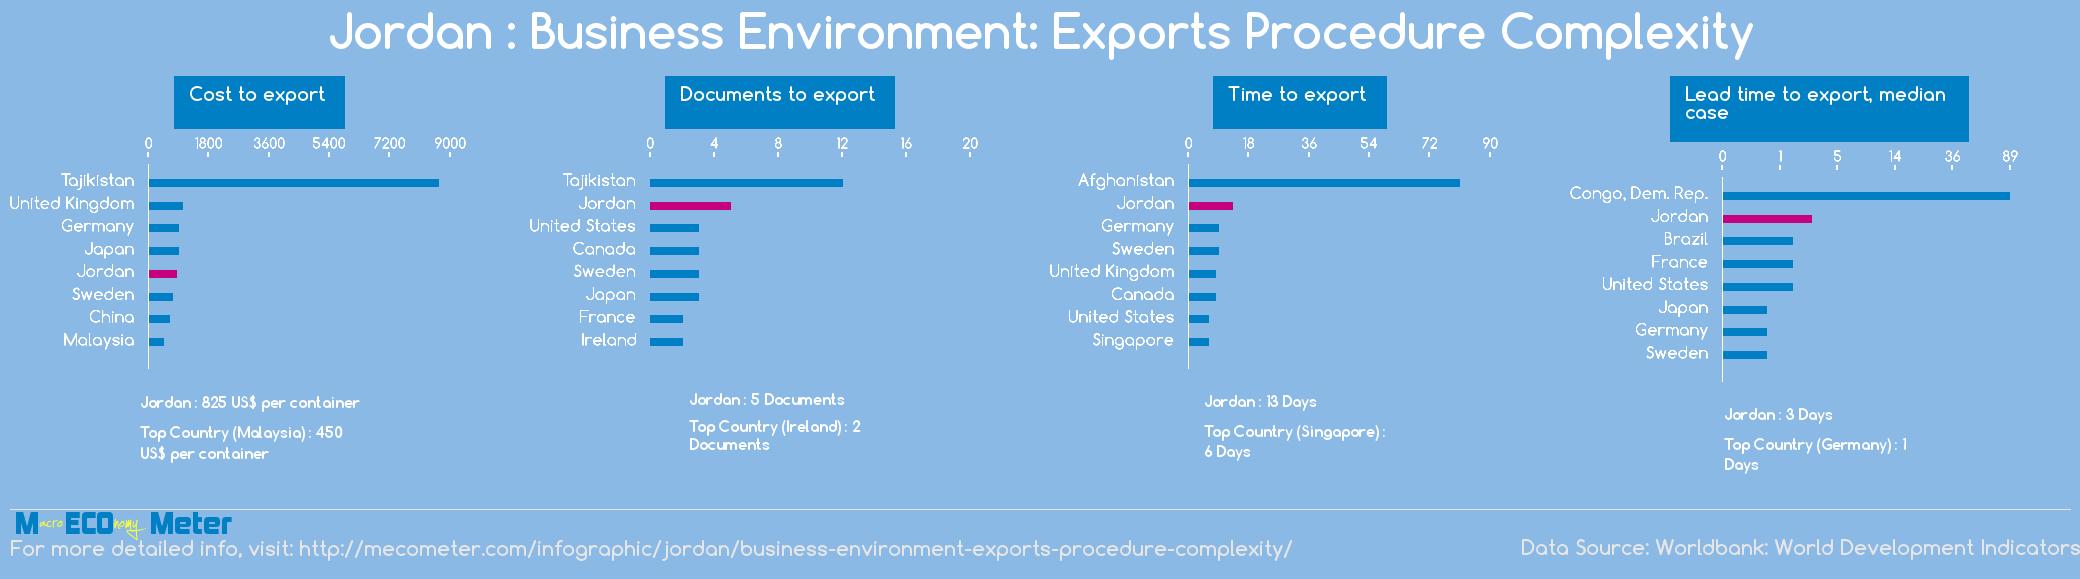 Jordan : Business Environment: Exports Procedure Complexity